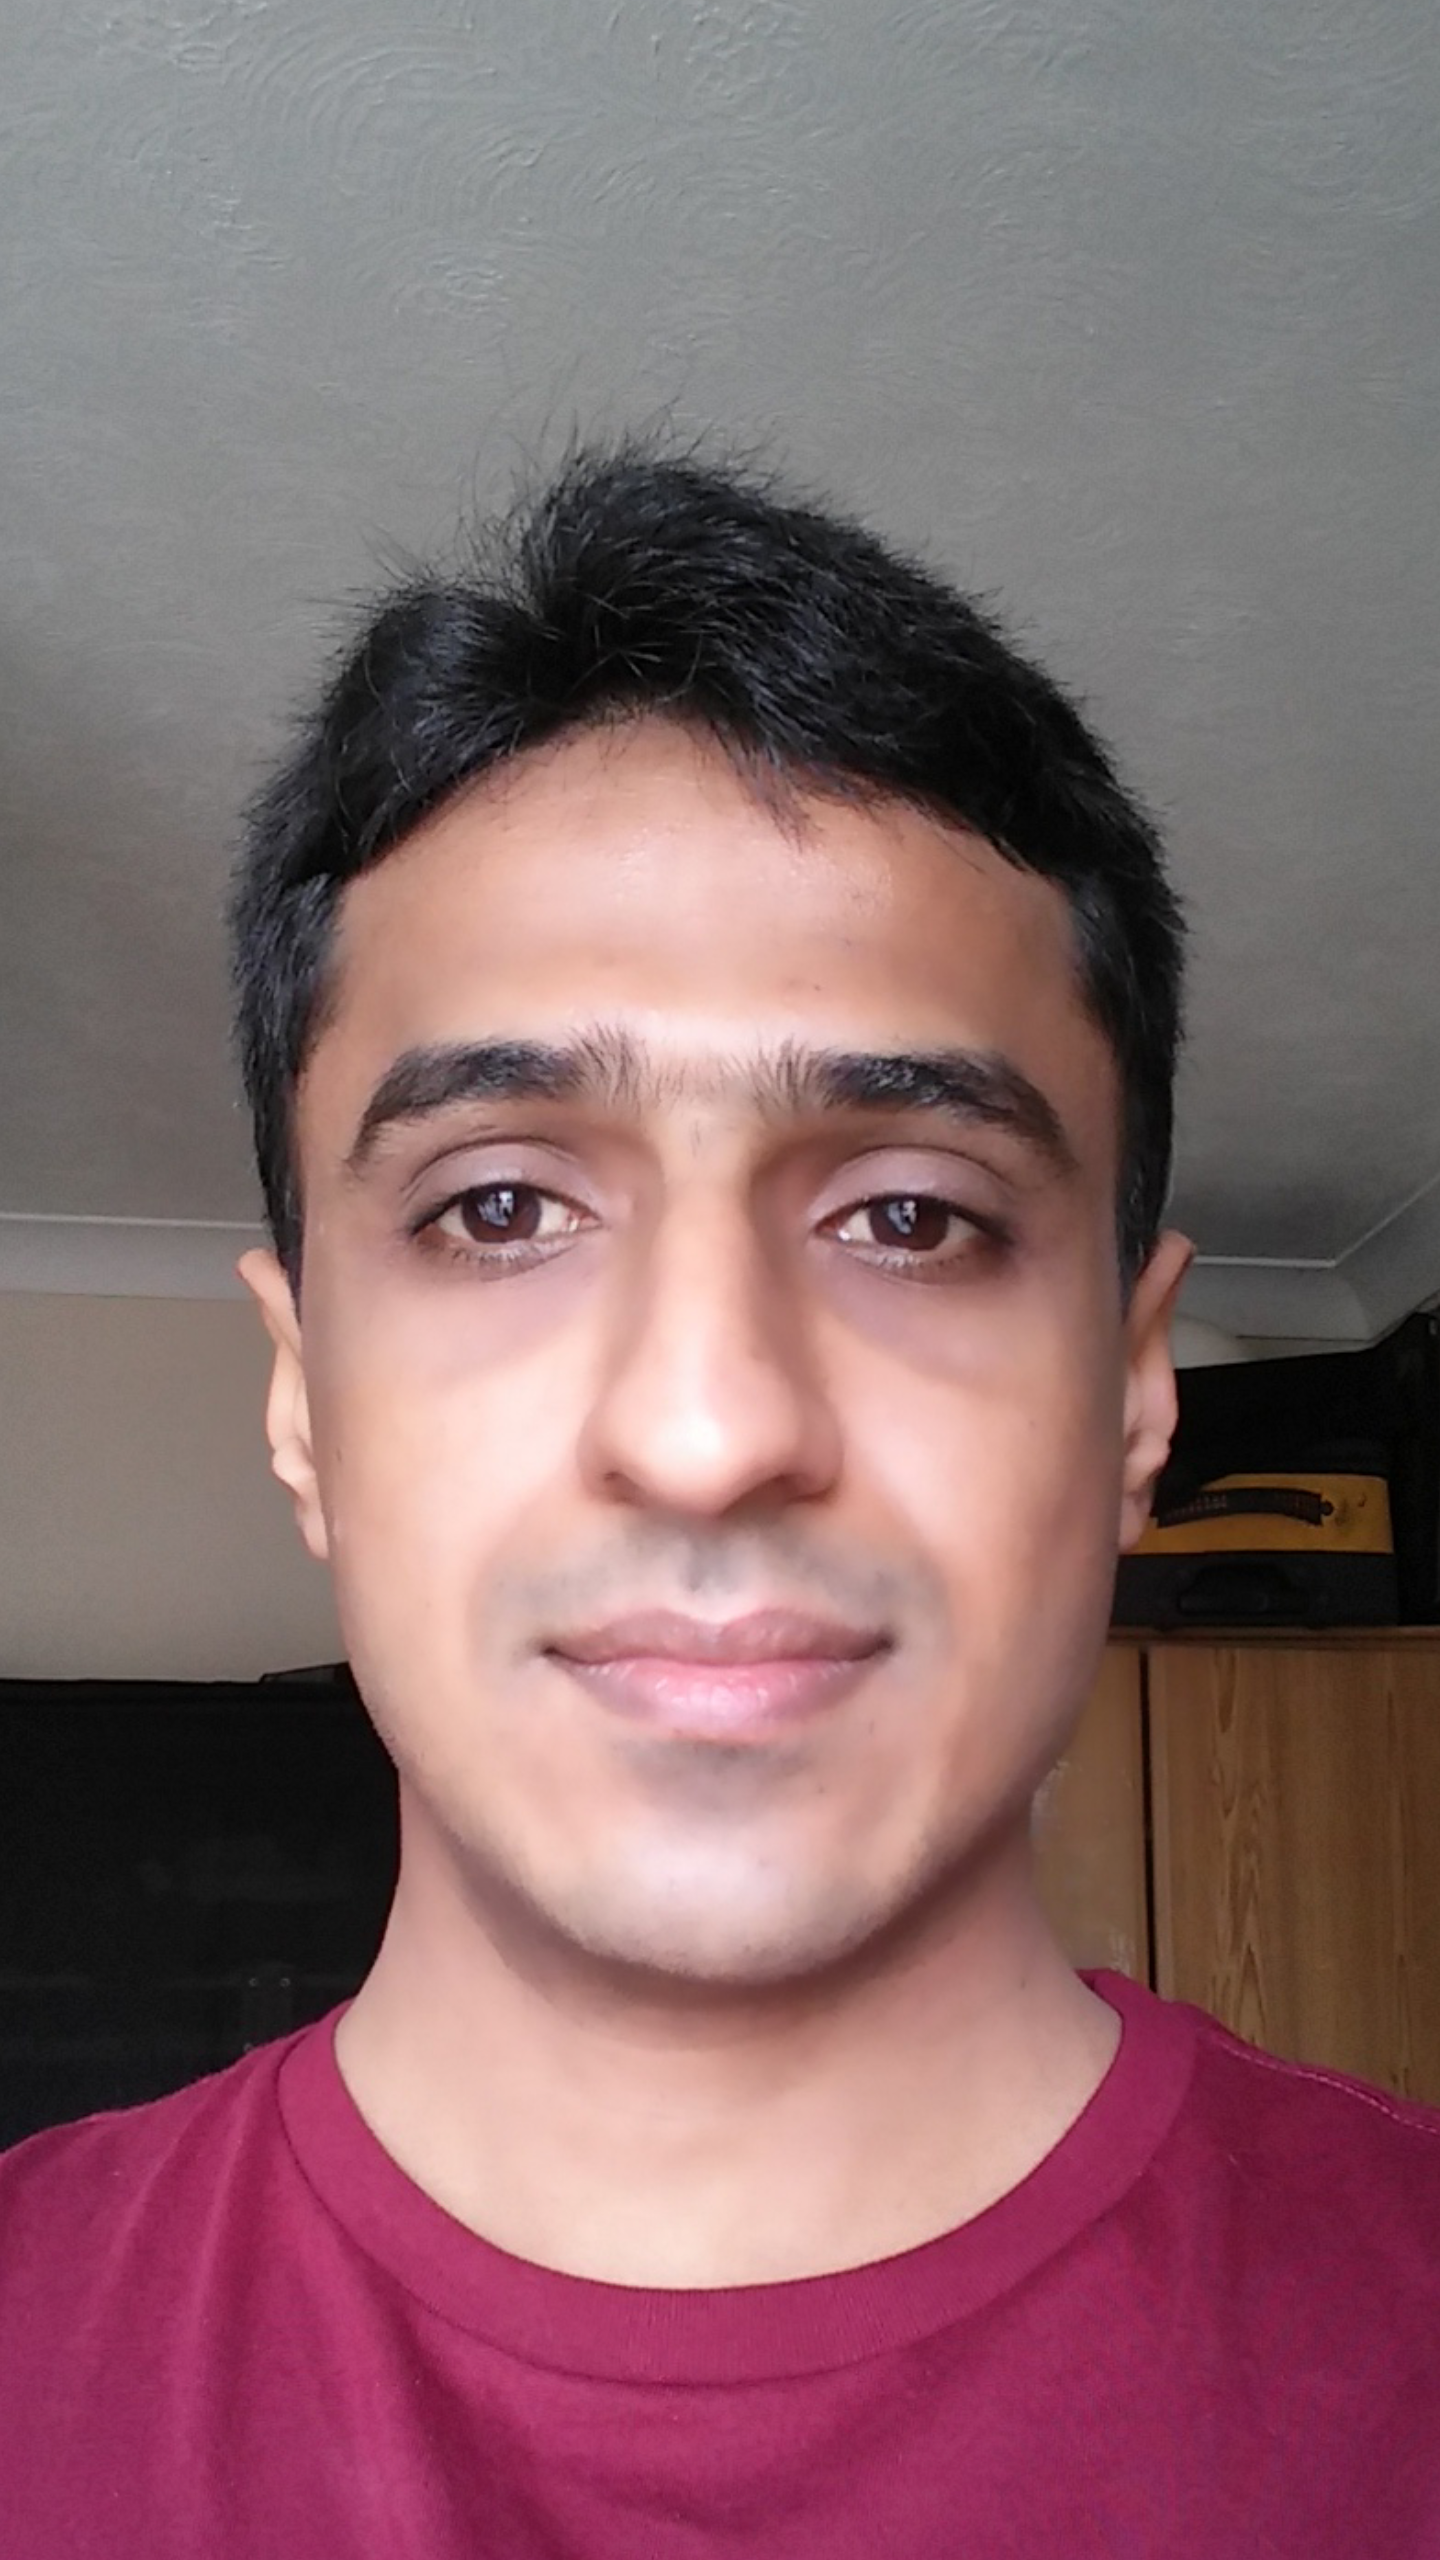 Mr. Raja Majid Ali Tutor